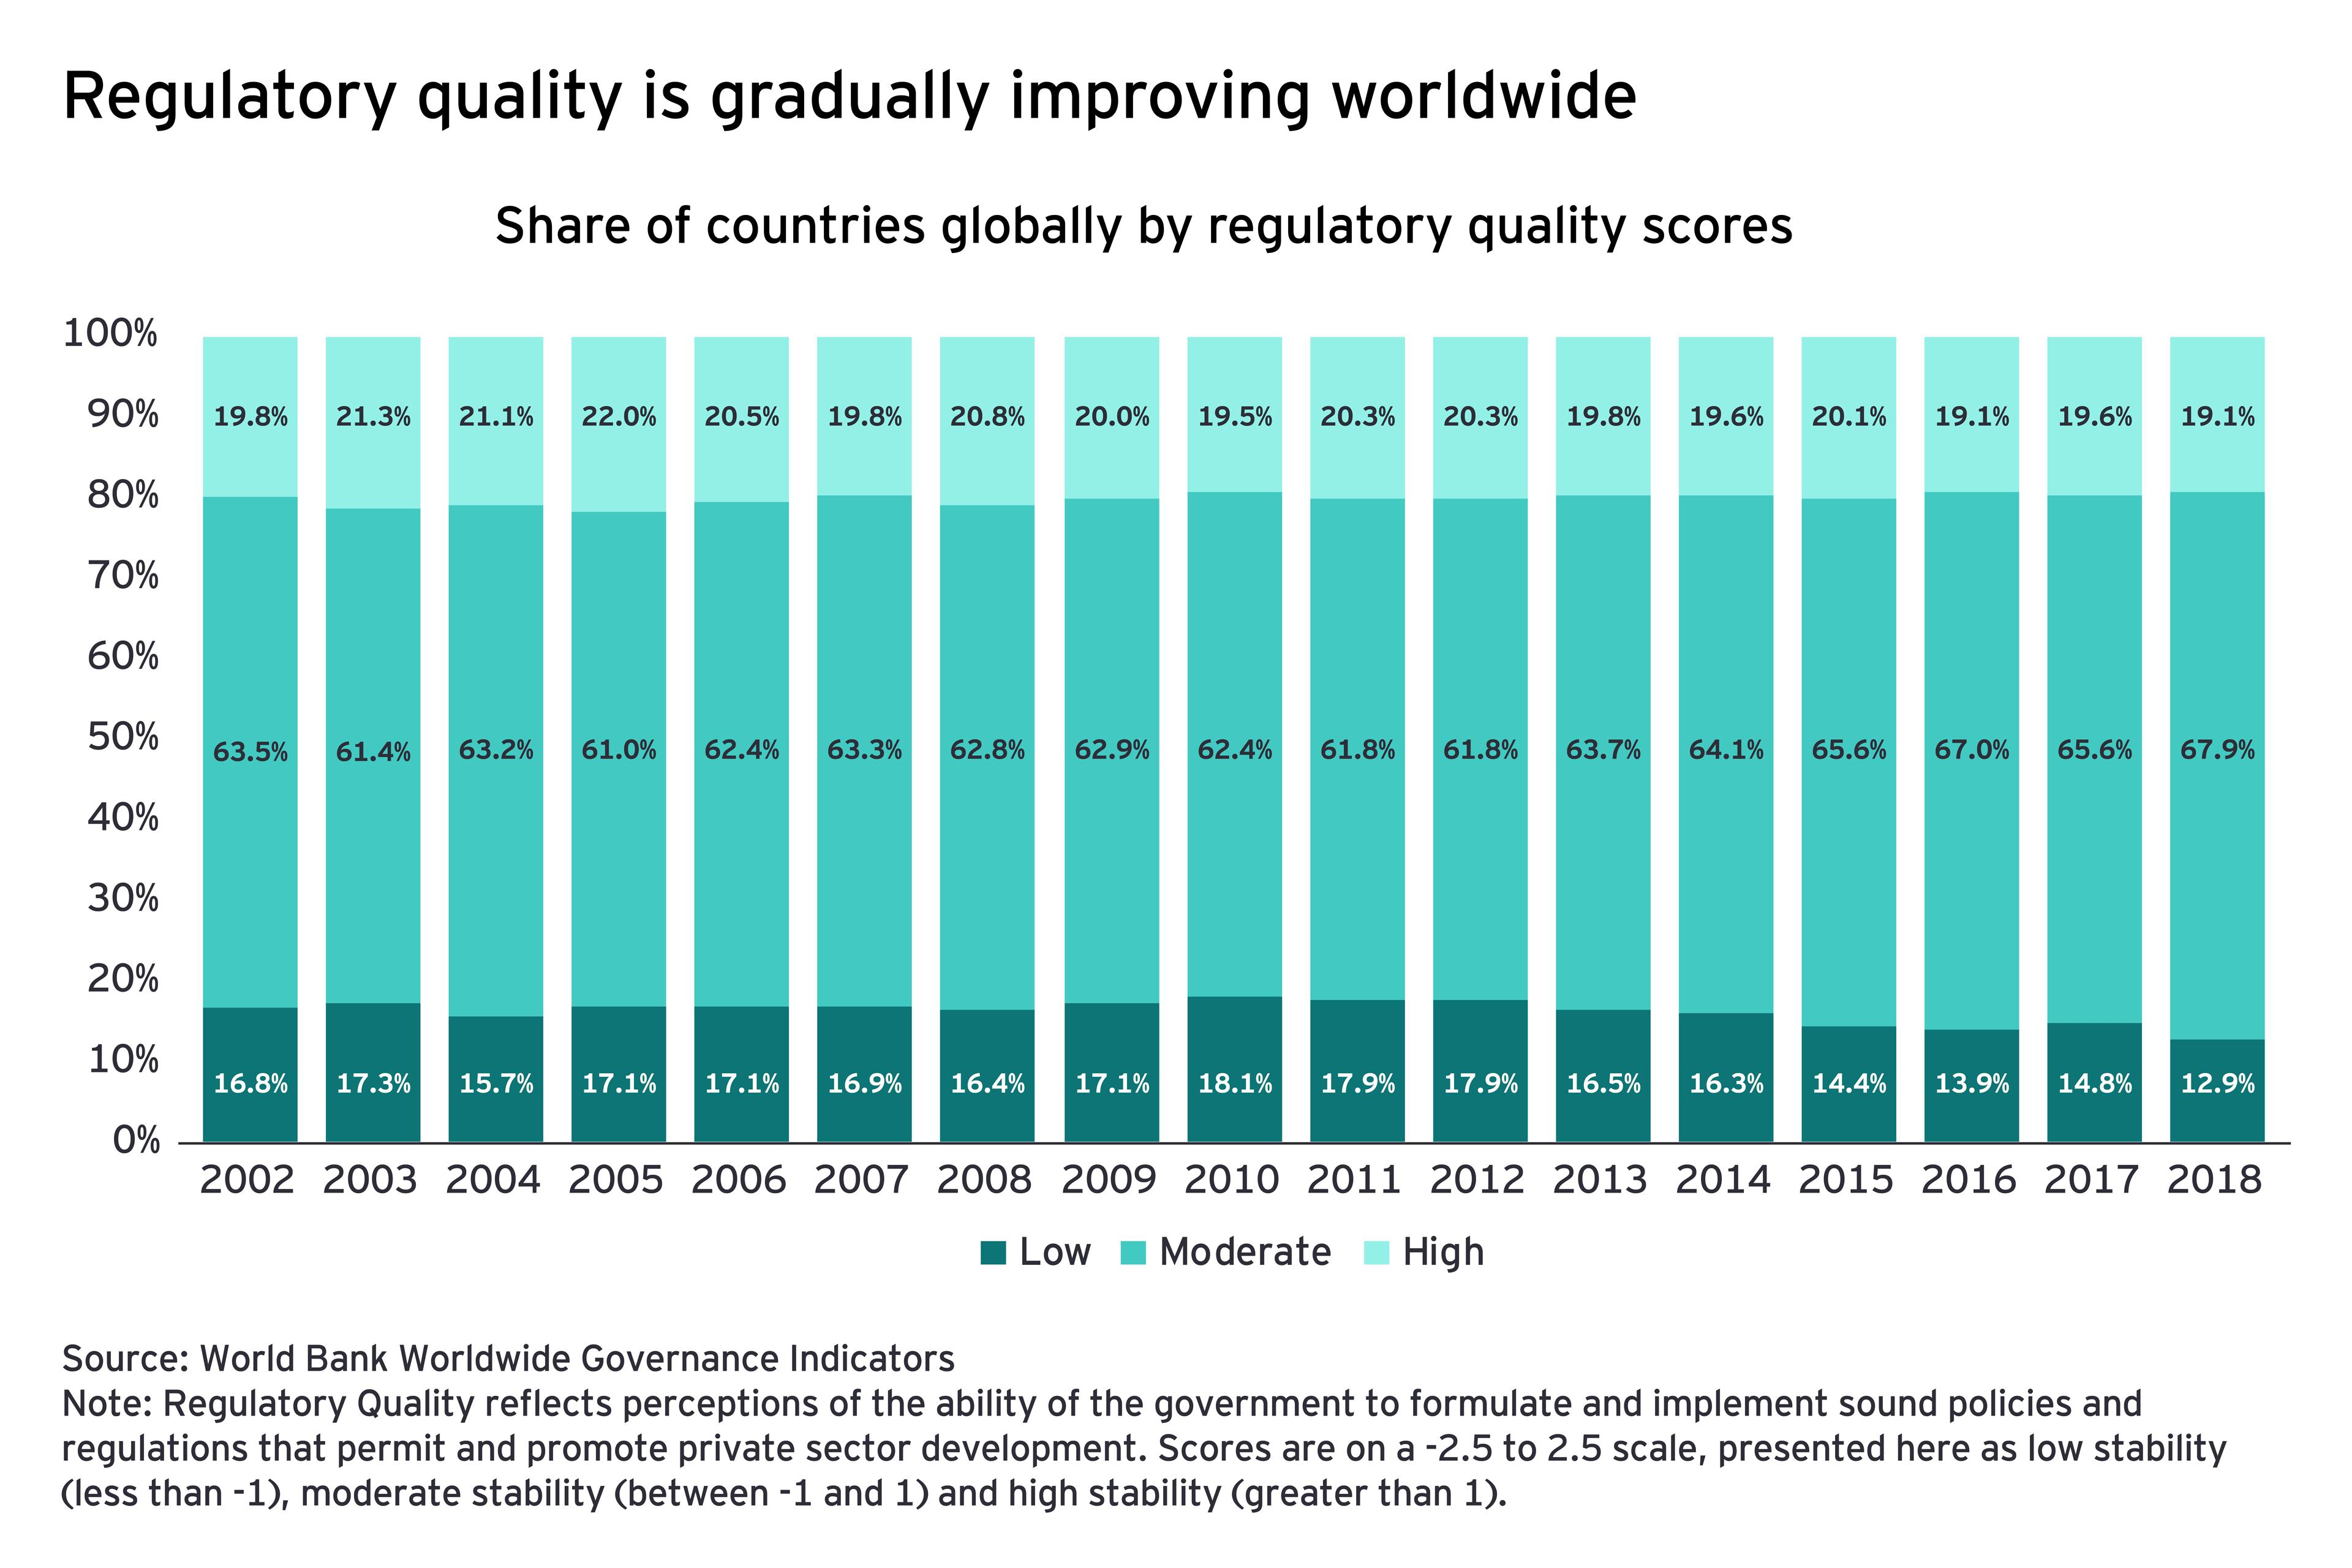 Regulatory quality is gradually improving worldwide